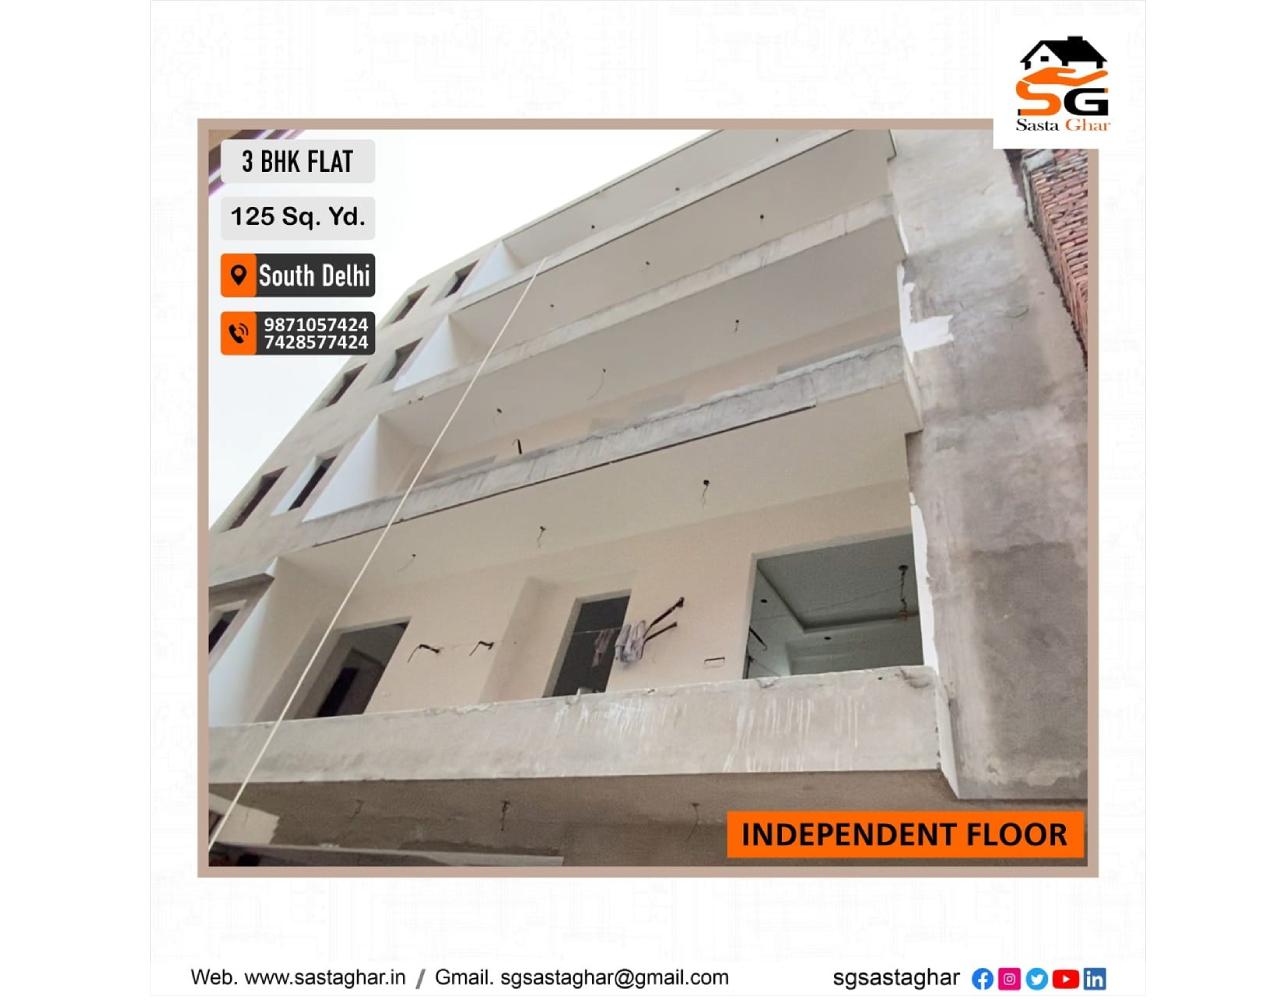 3 BHK flats in Chhatarpur